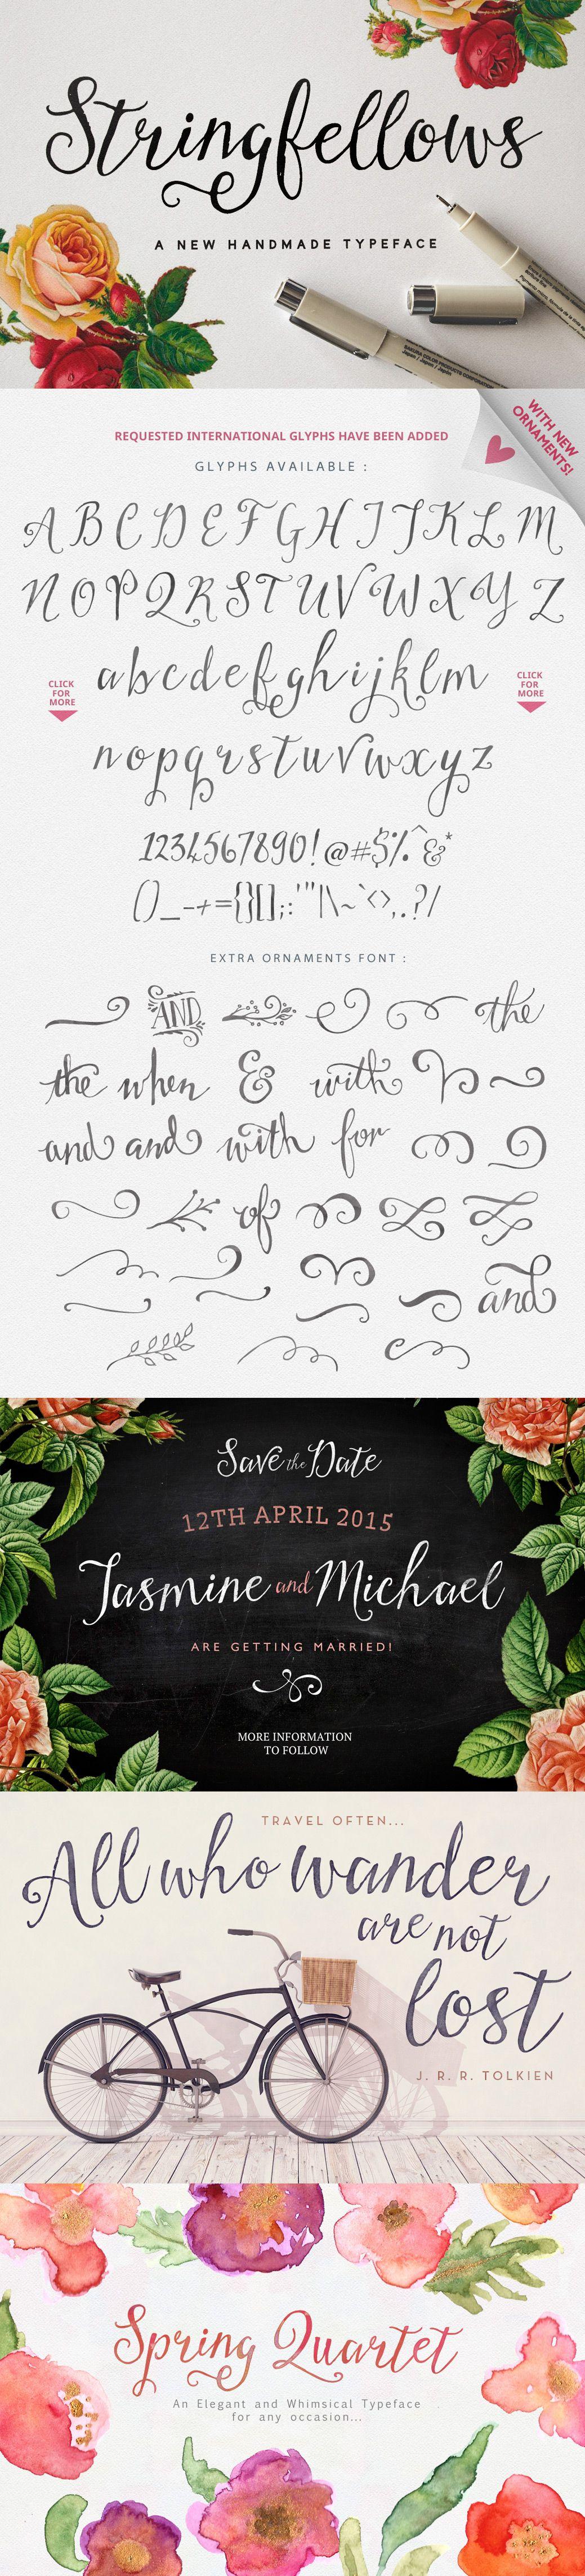 Stringfellows by Nicky Laatz httpwwwdesigncutscomdesign cuts deals30 best selling creative fonts